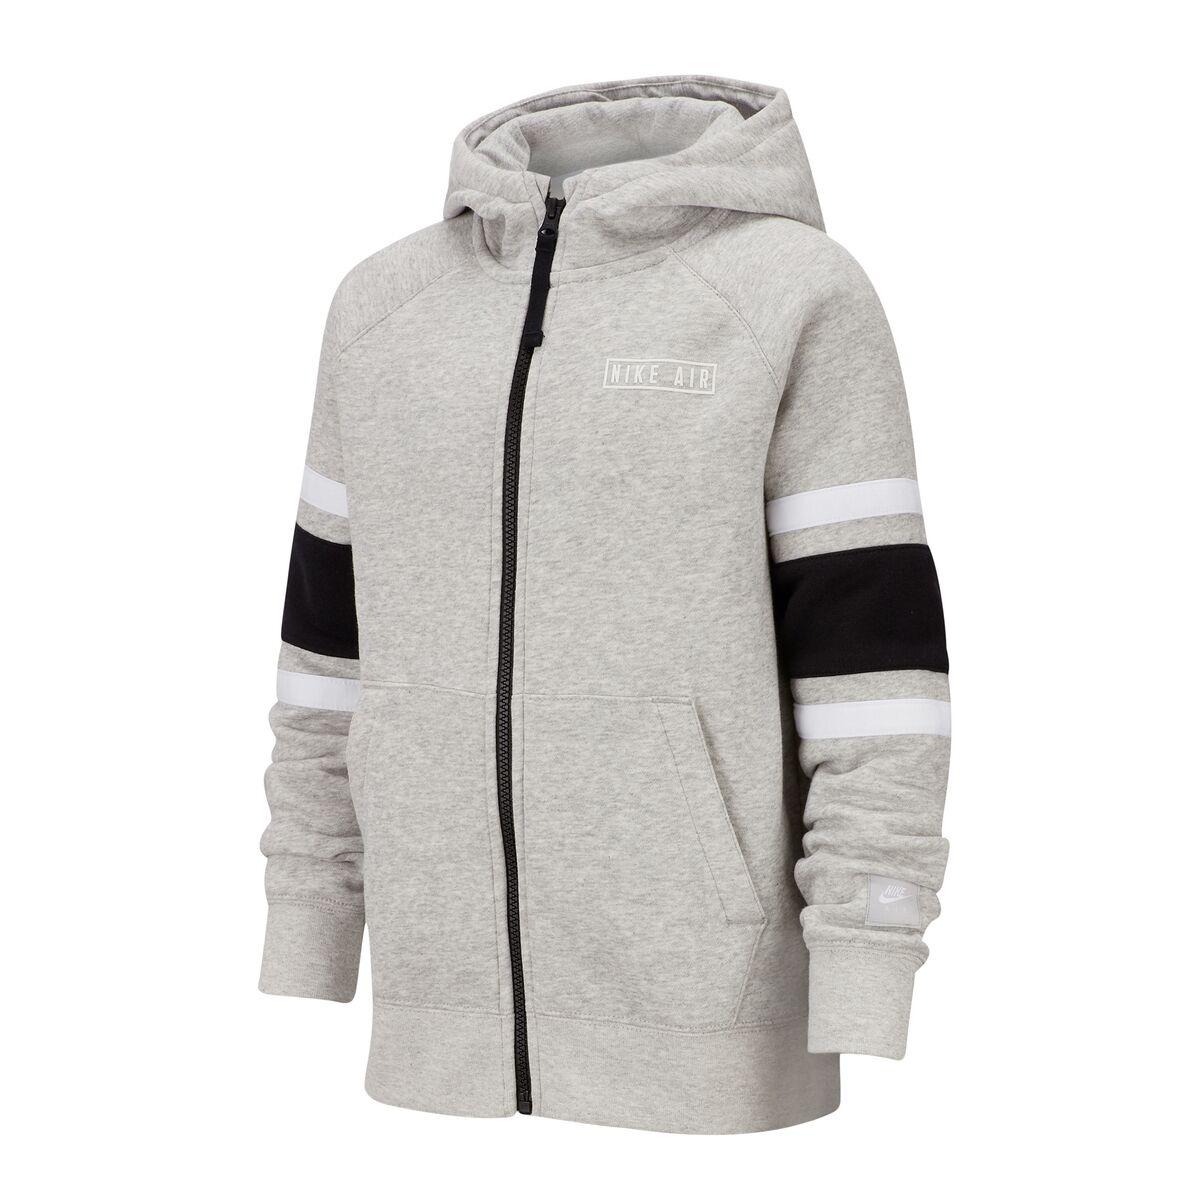 NIKE Sweat zippé à capuche Nike Air 6 - 16 ans